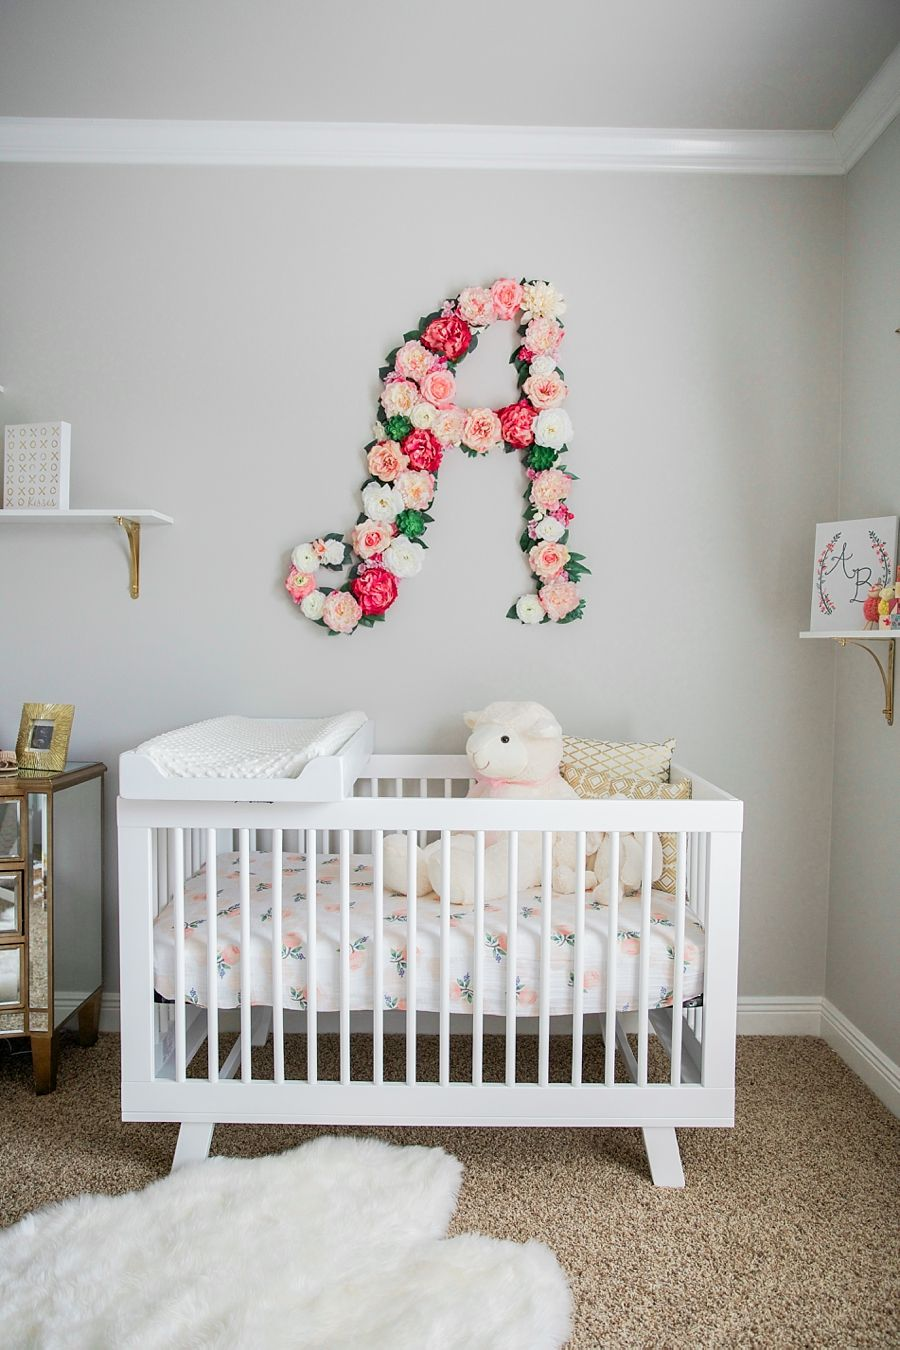 Baby girl nursery with floral wall  Shop Rent Consign MotherhoodClosetcom Maternity